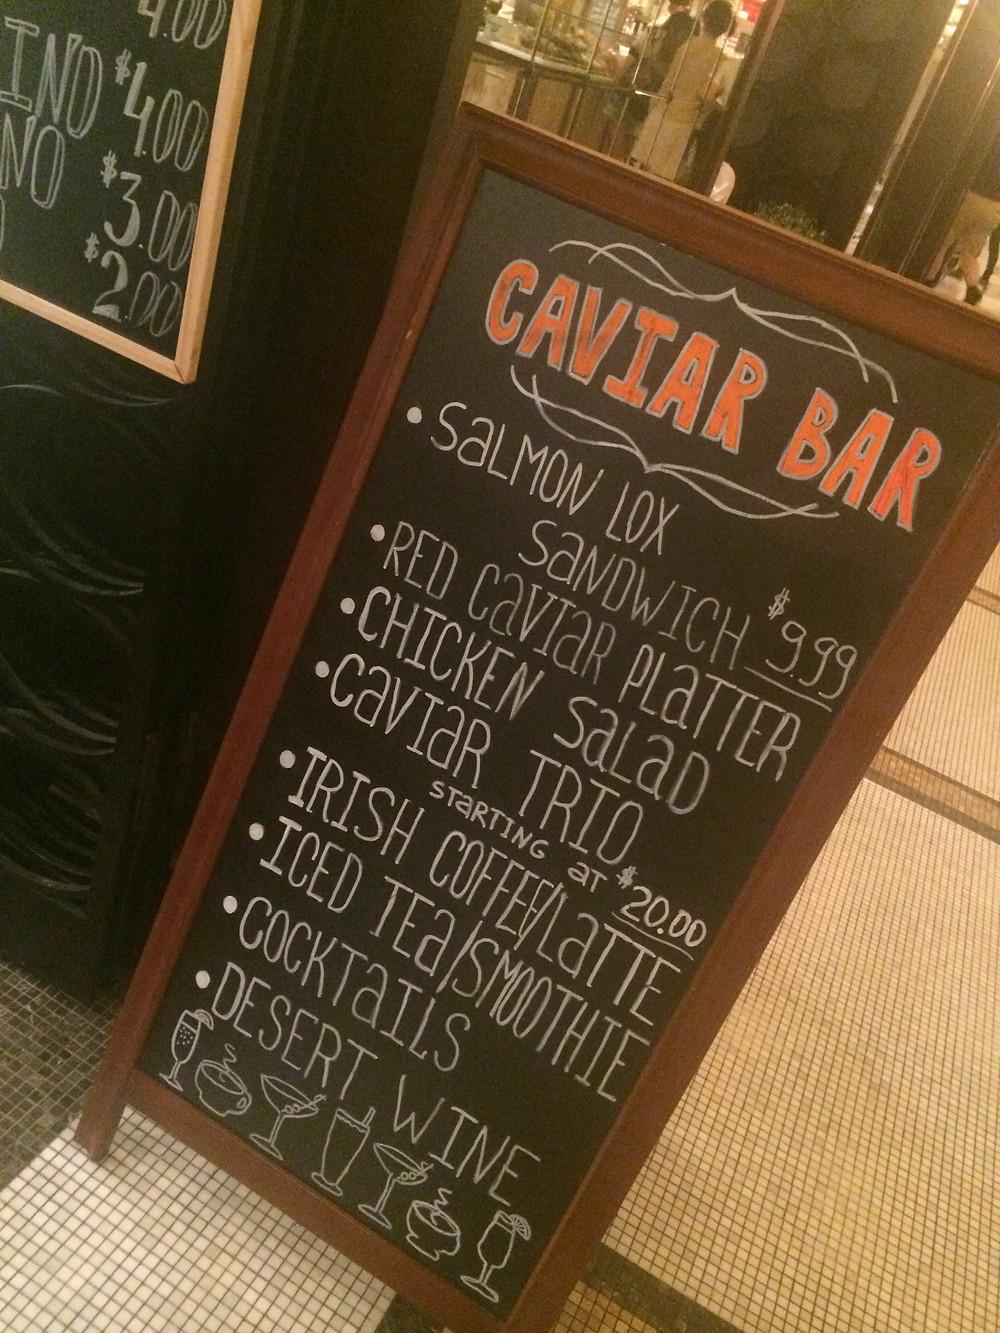 Olma Caviar Boutique 2.jpg